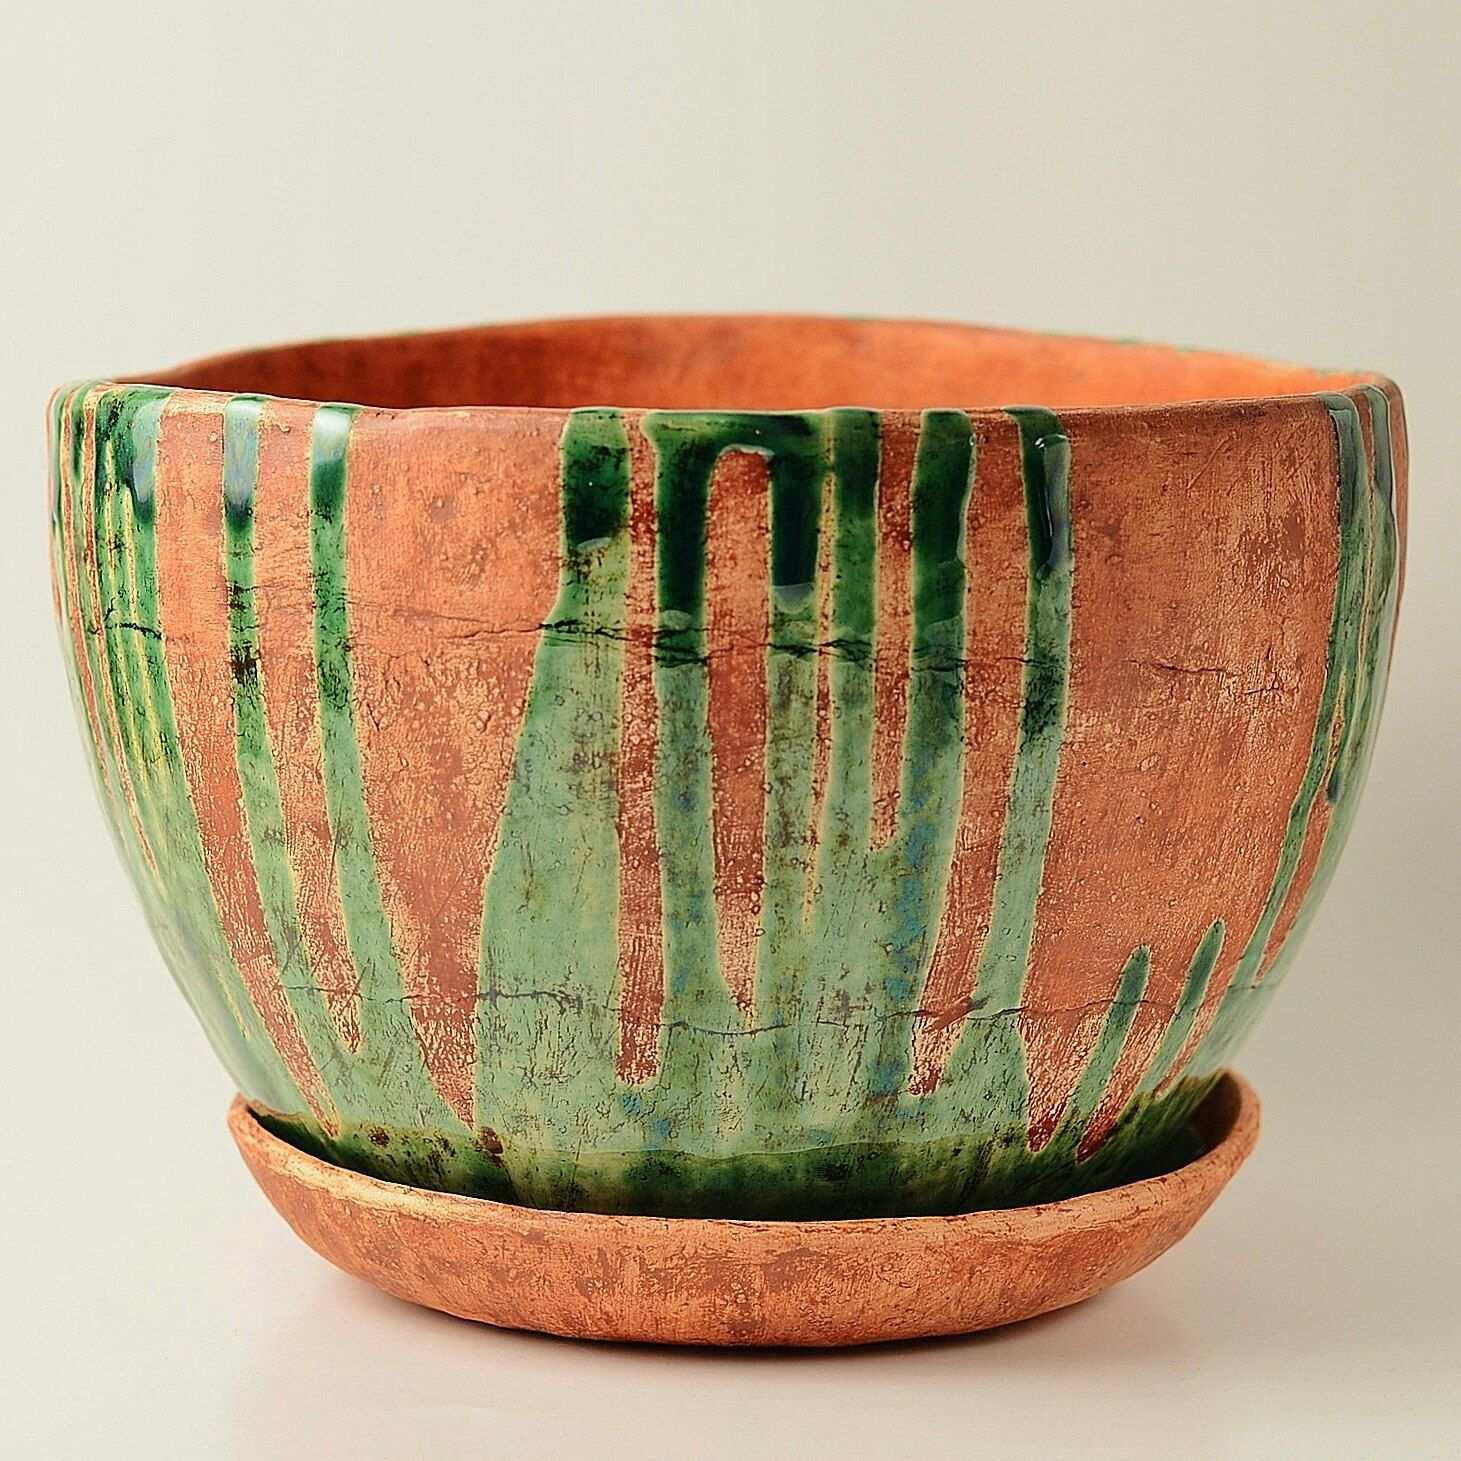 New Model Of Rustic Ceramic Large Flower Planter Pot In Our Shop Flower Pots Flower Pot Design Pot Designs